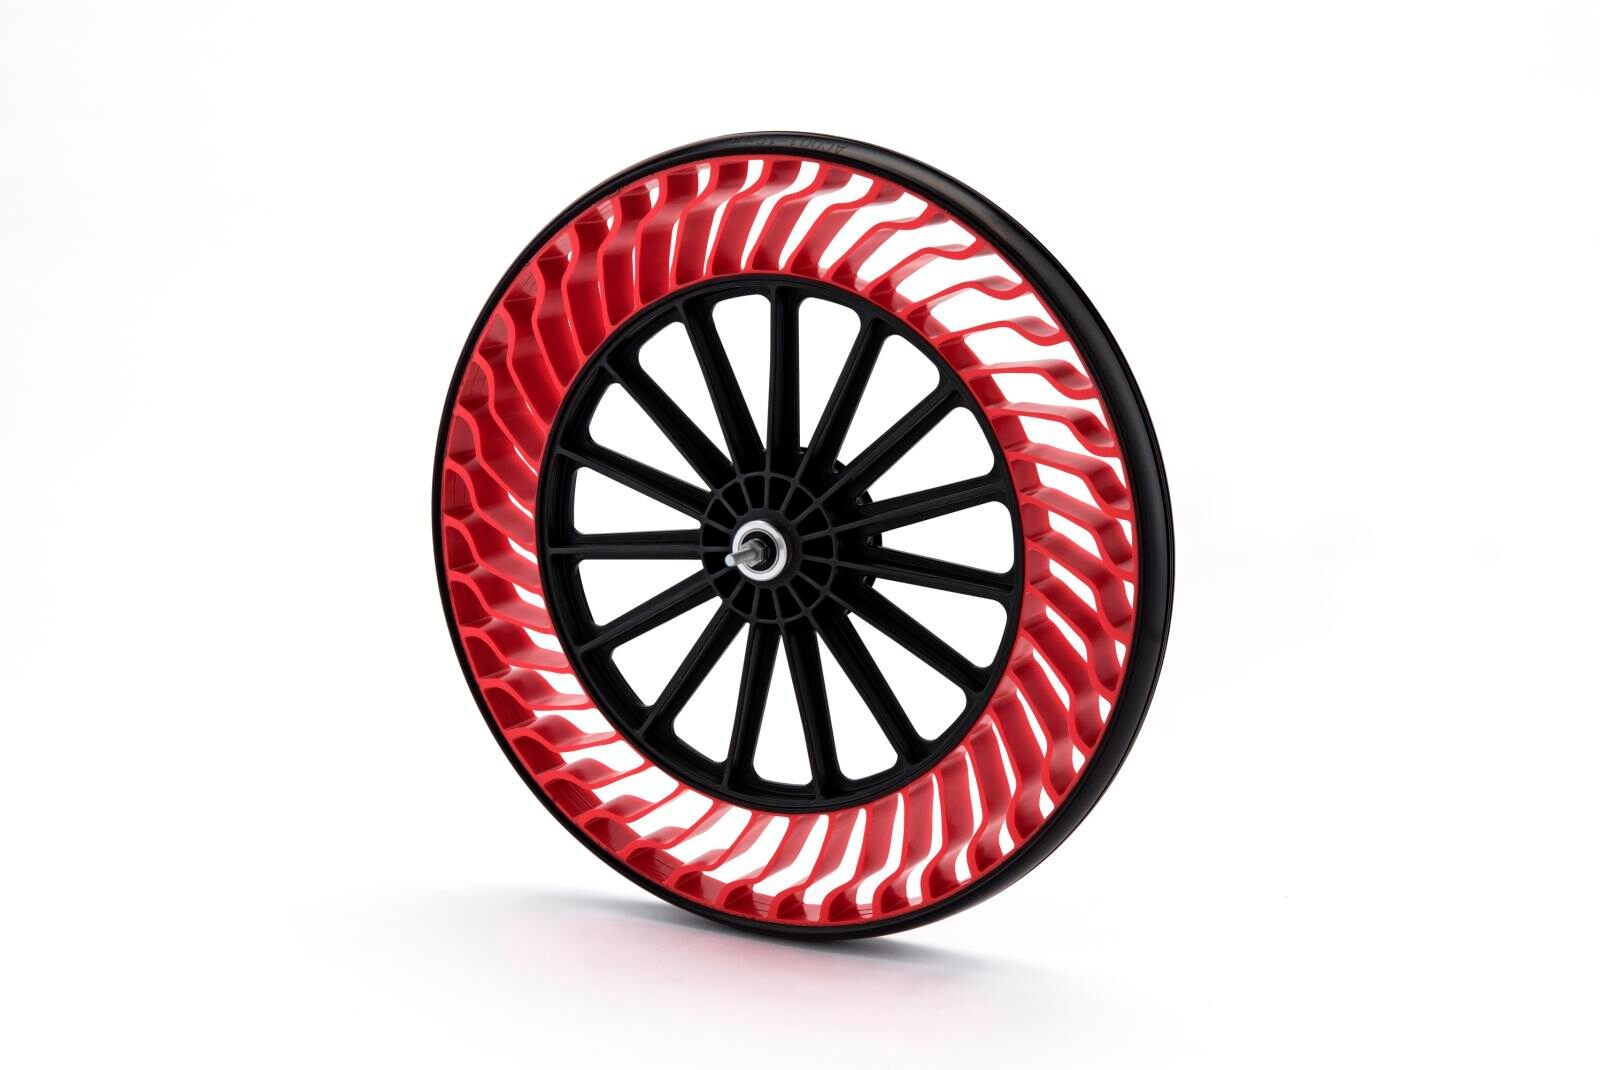 Bridgestone to Demonstrate Airless Tire, Proactive Technology